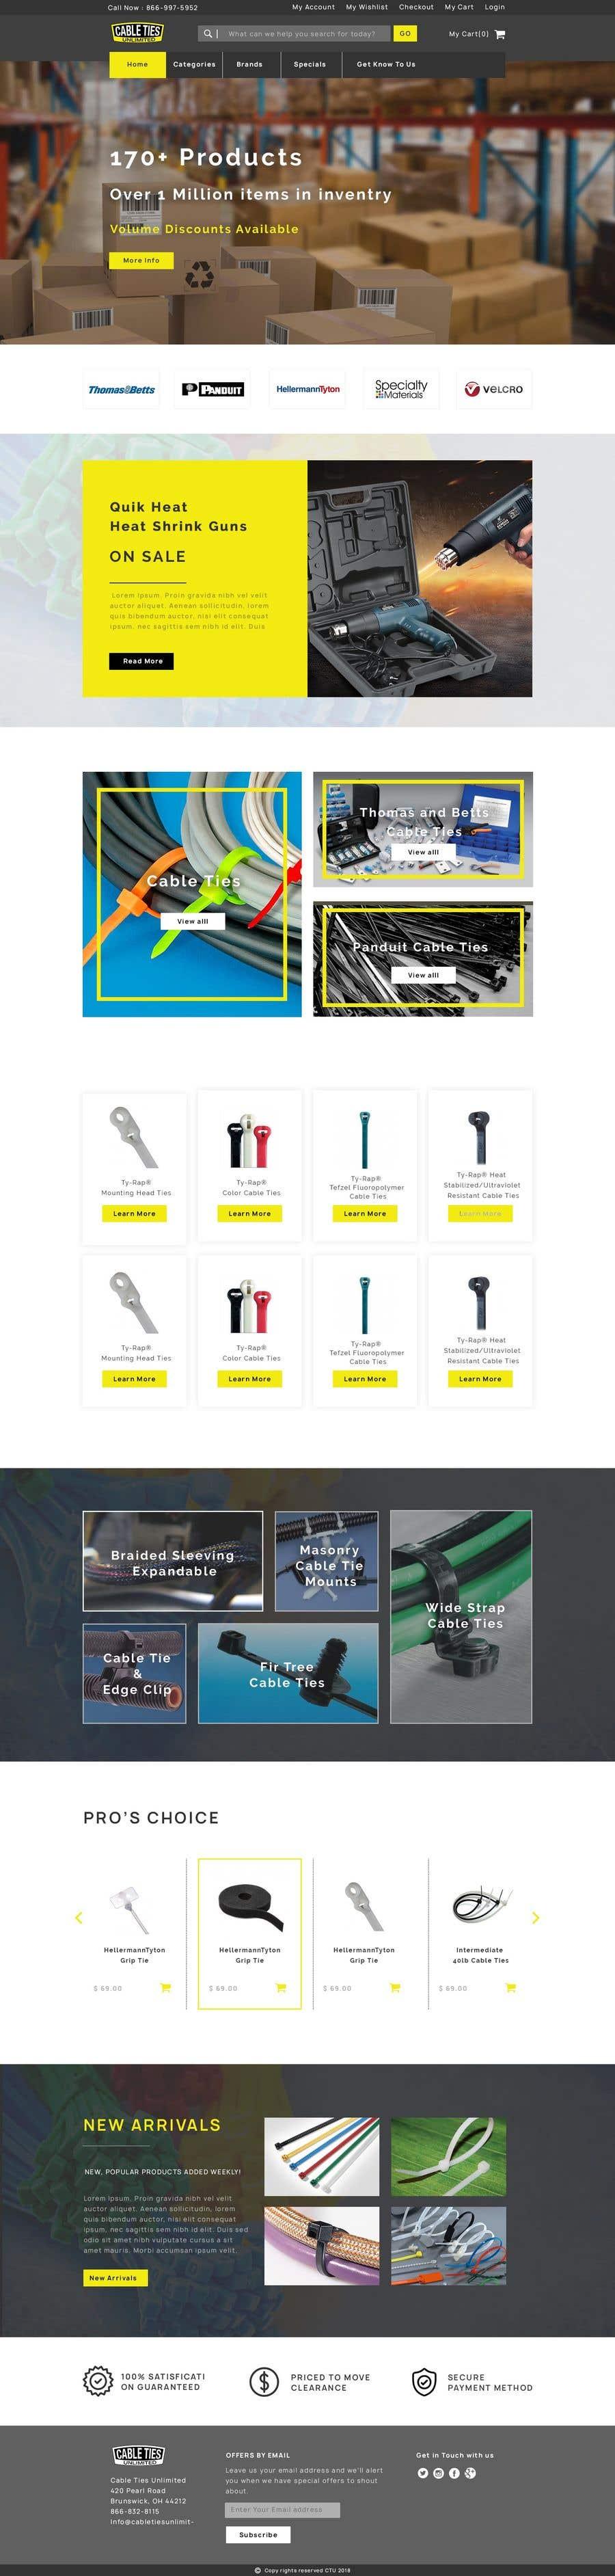 Kilpailutyö #26 kilpailussa Redesign an Ecommerce Website Homepage